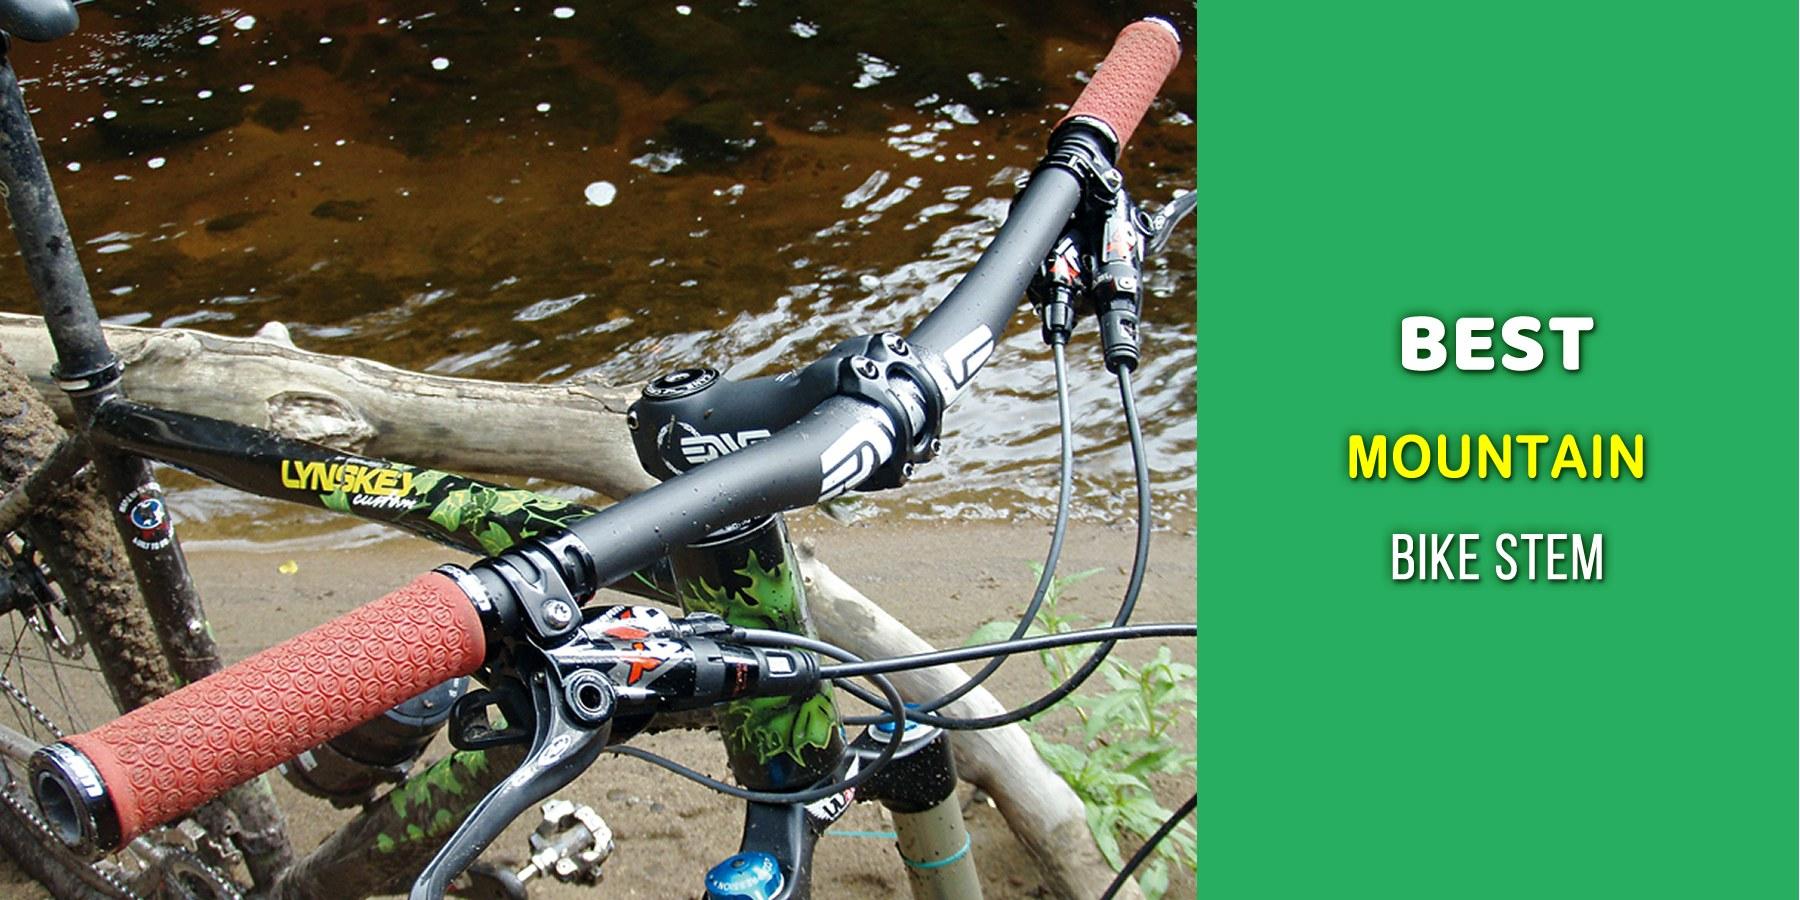 Syntace Force Stem 120mm 6 ° MTB Fully Road Bike Cross Mountain Bike NEW